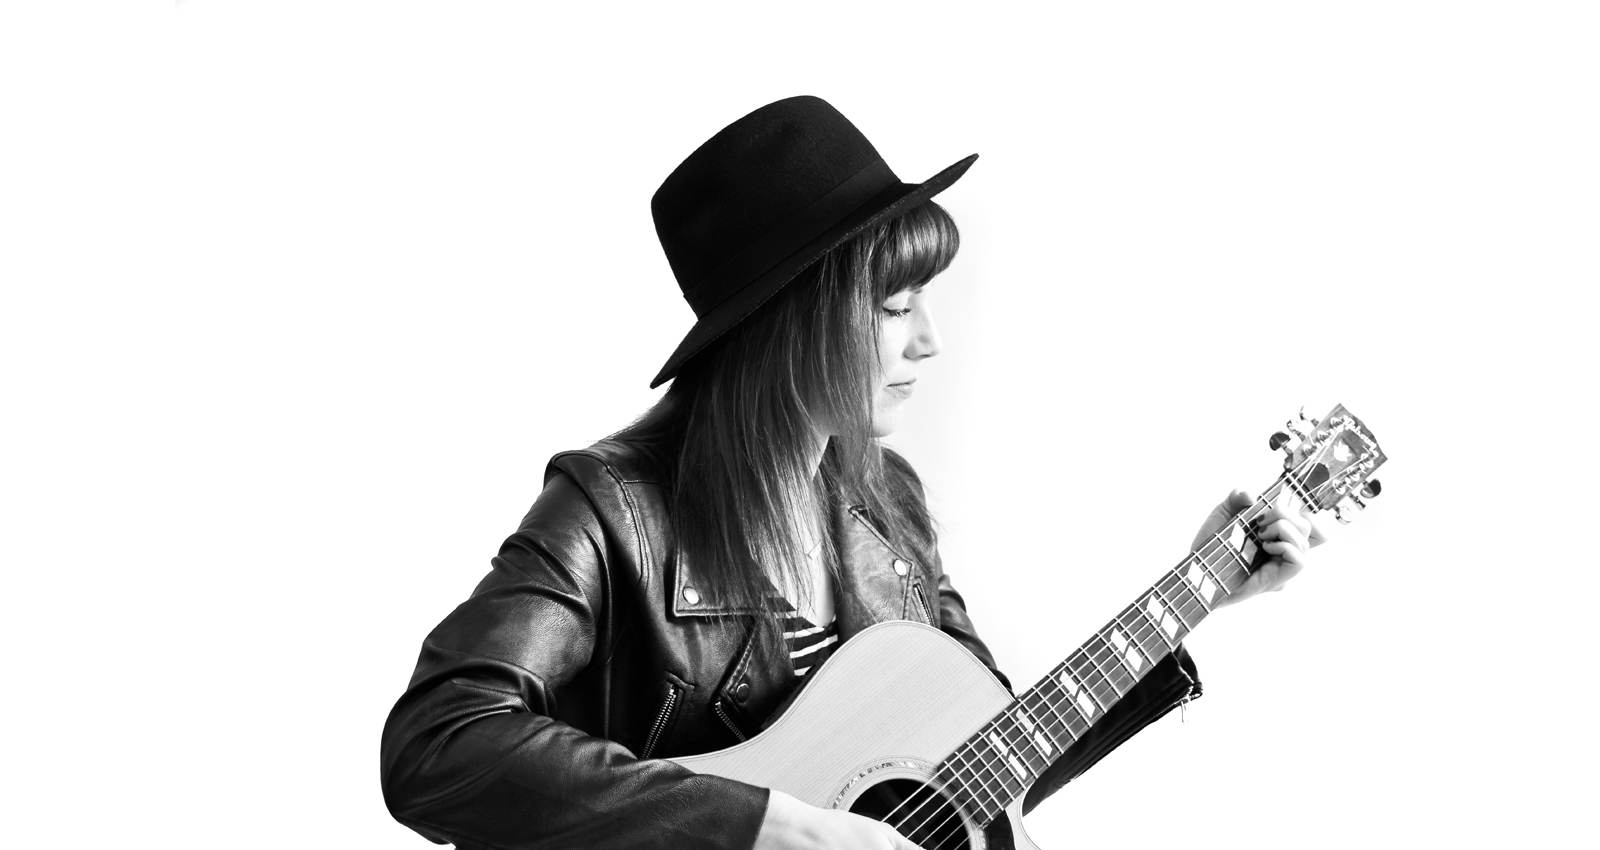 SAMMIES-Singer Songwriter.JPG